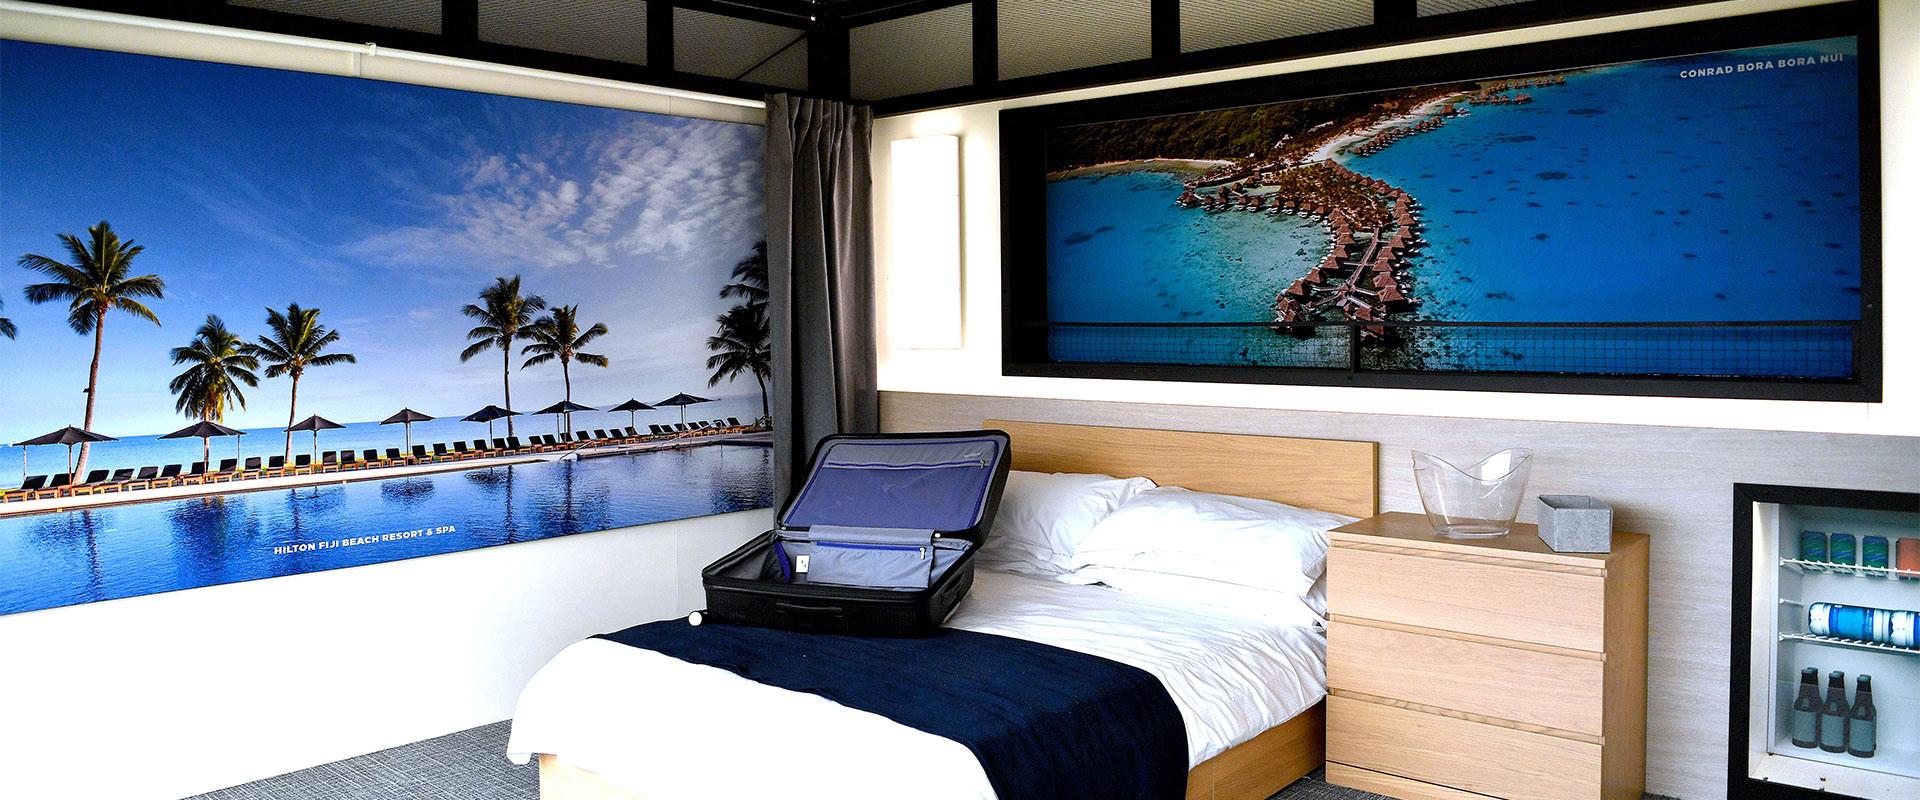 WA3F_Hilton_Australia_002.jpg